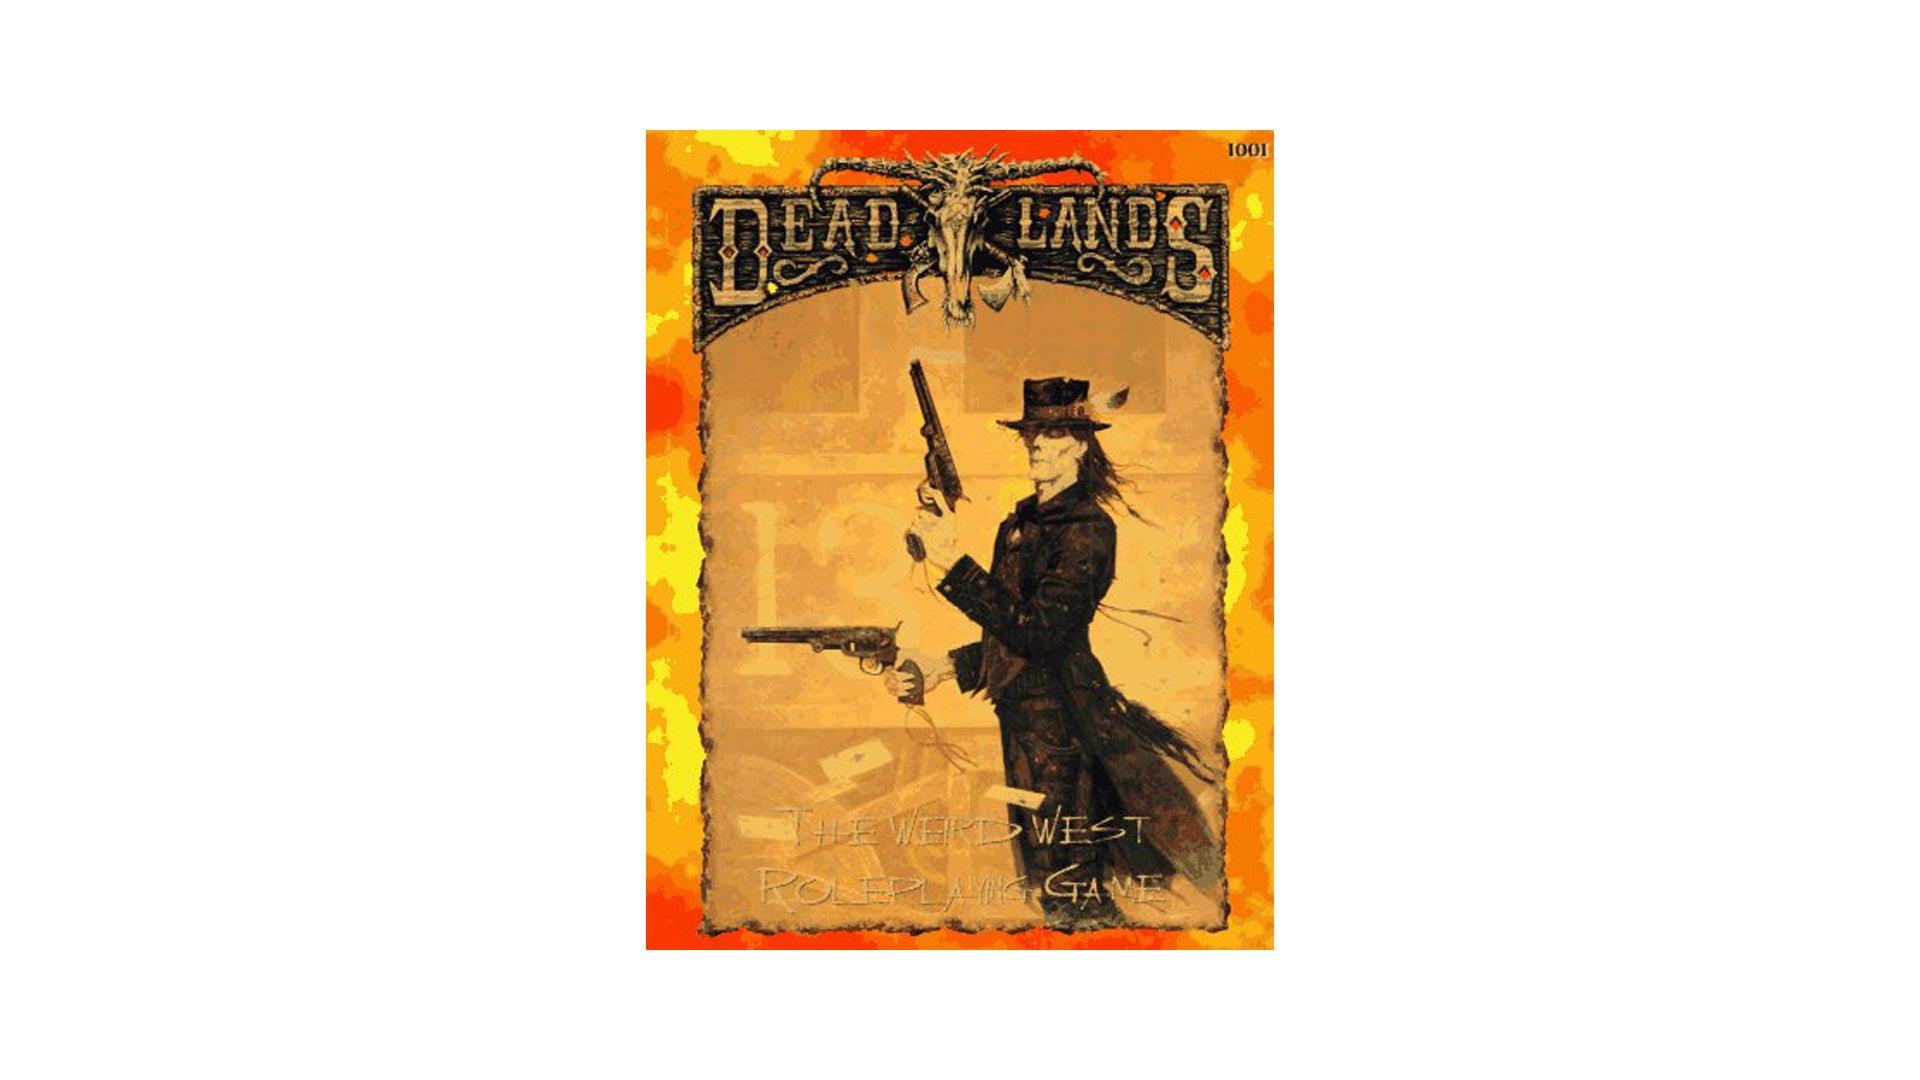 Deadlands_weirdwestroleplayinggame.jpg